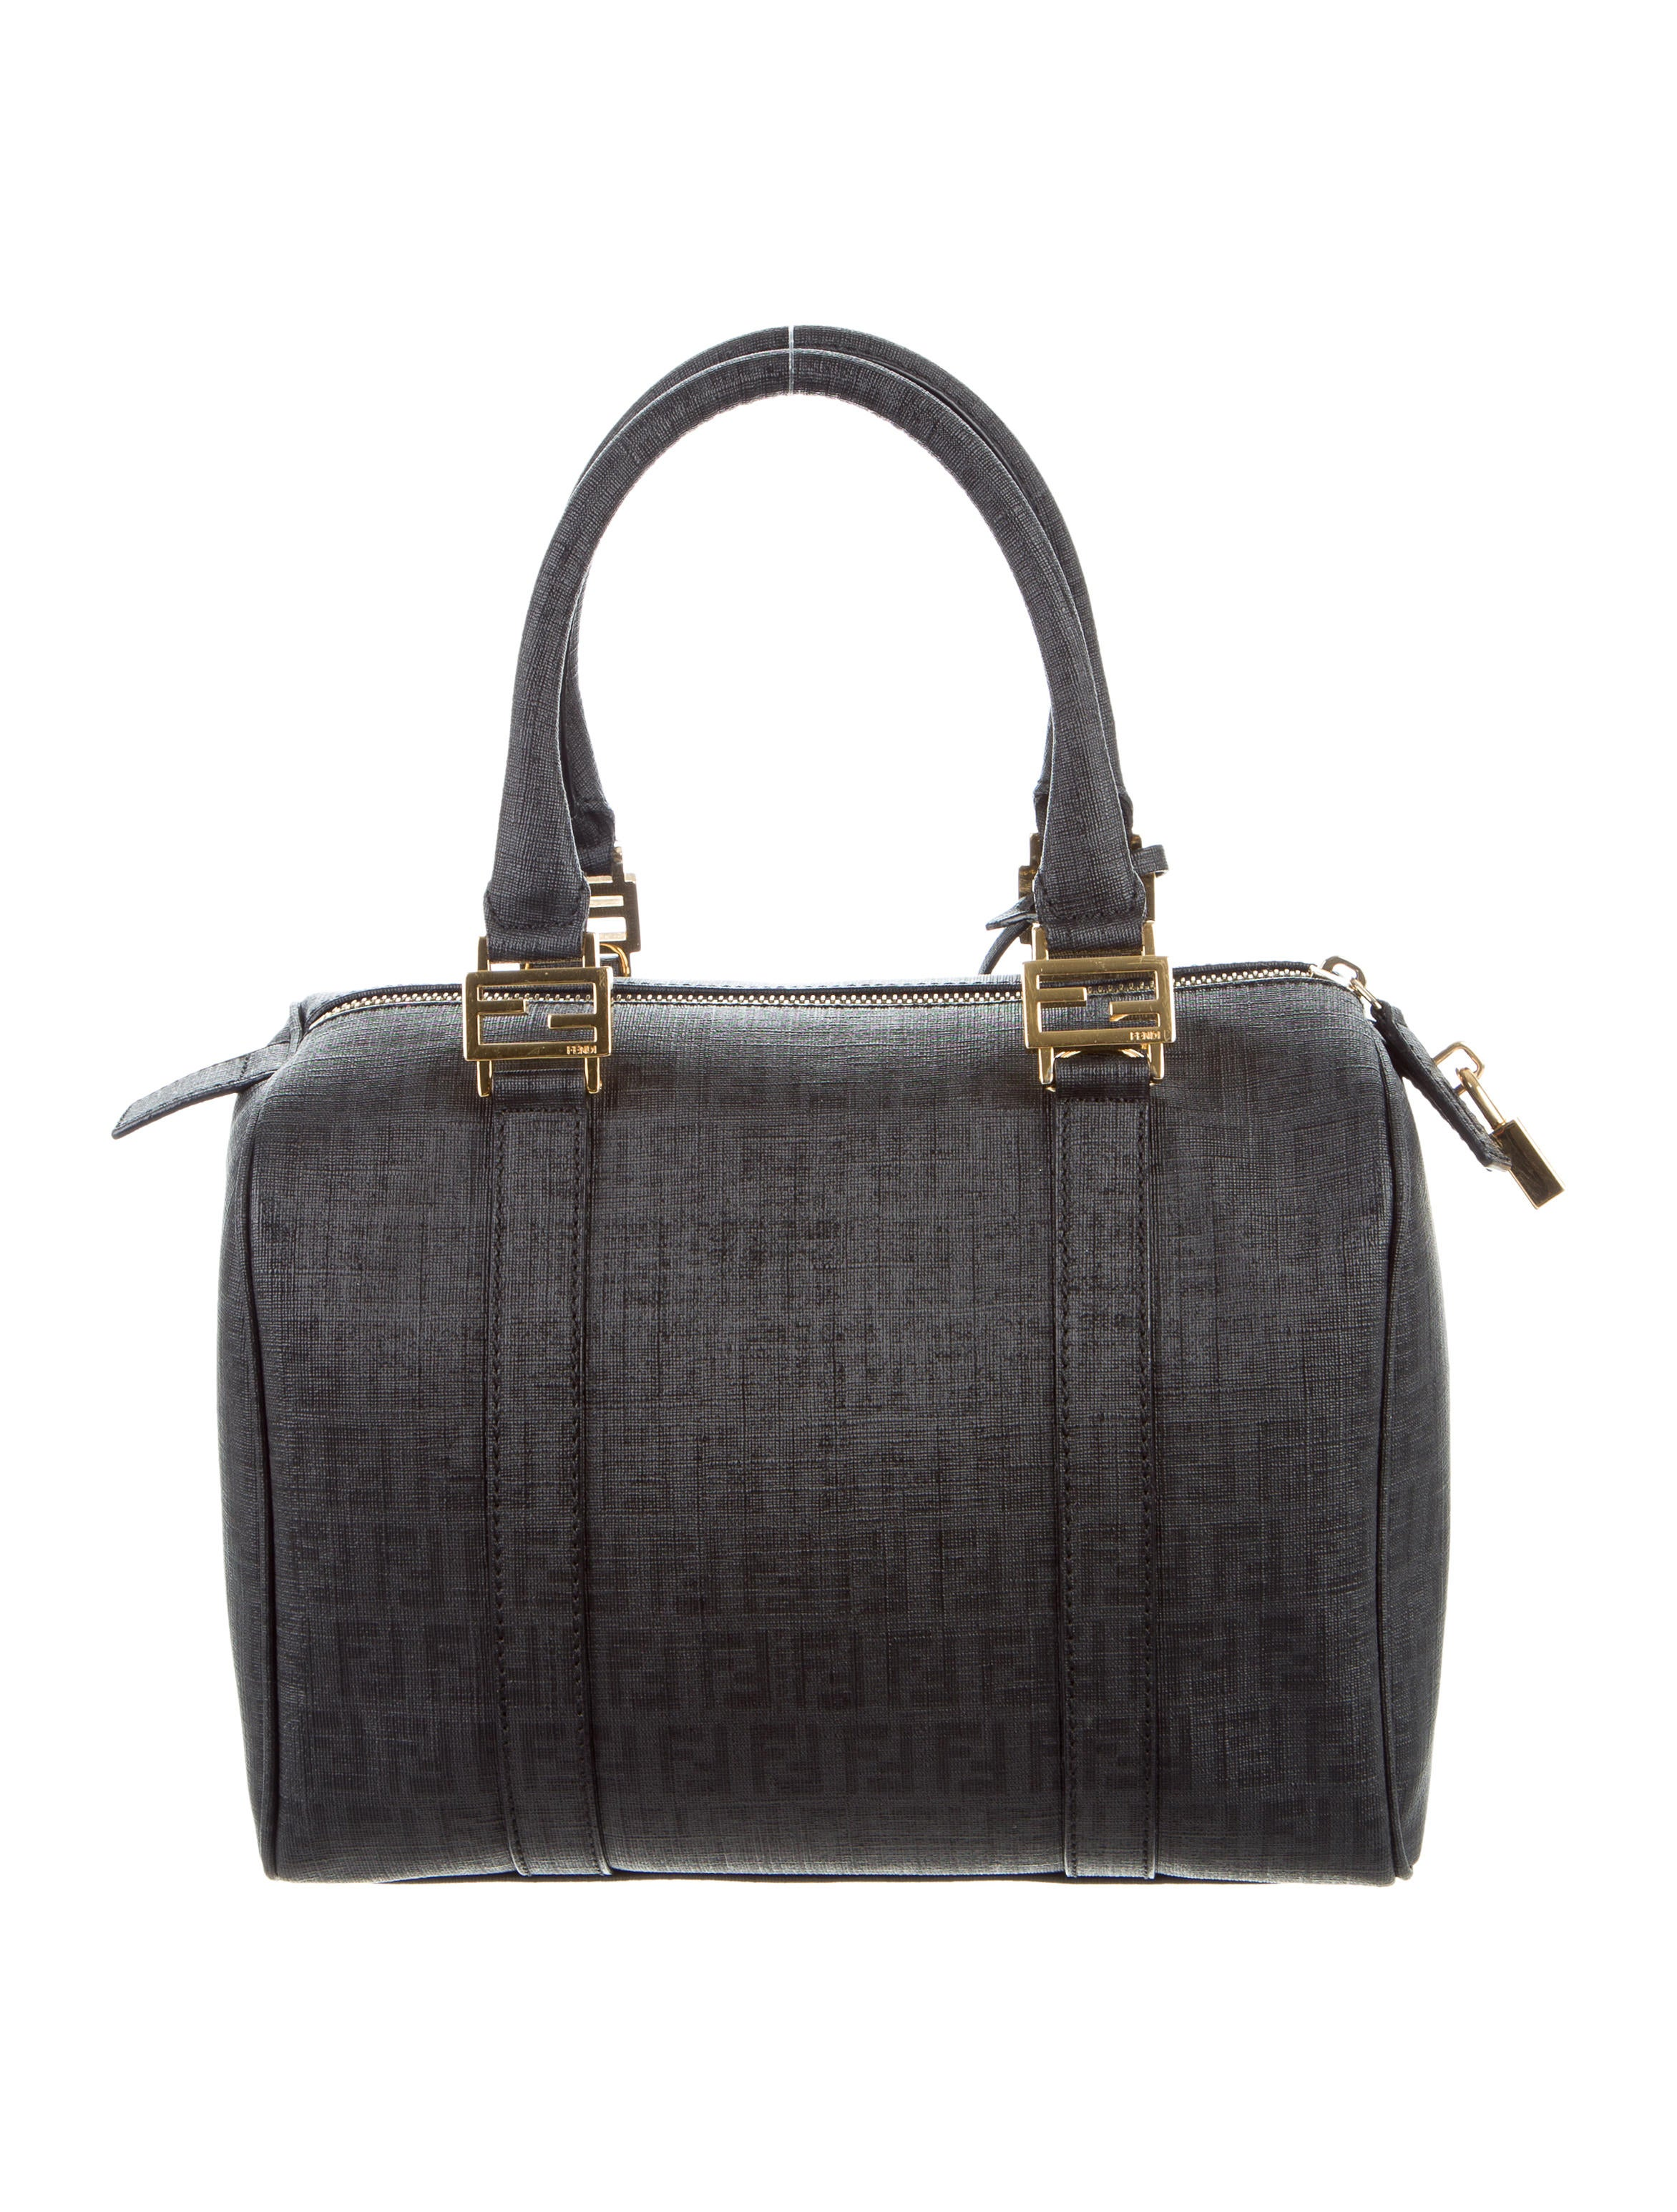 Boston Bag Patchwork Tutorial: Fendi Zucchino Boston Bag - Handbags - FEN54709